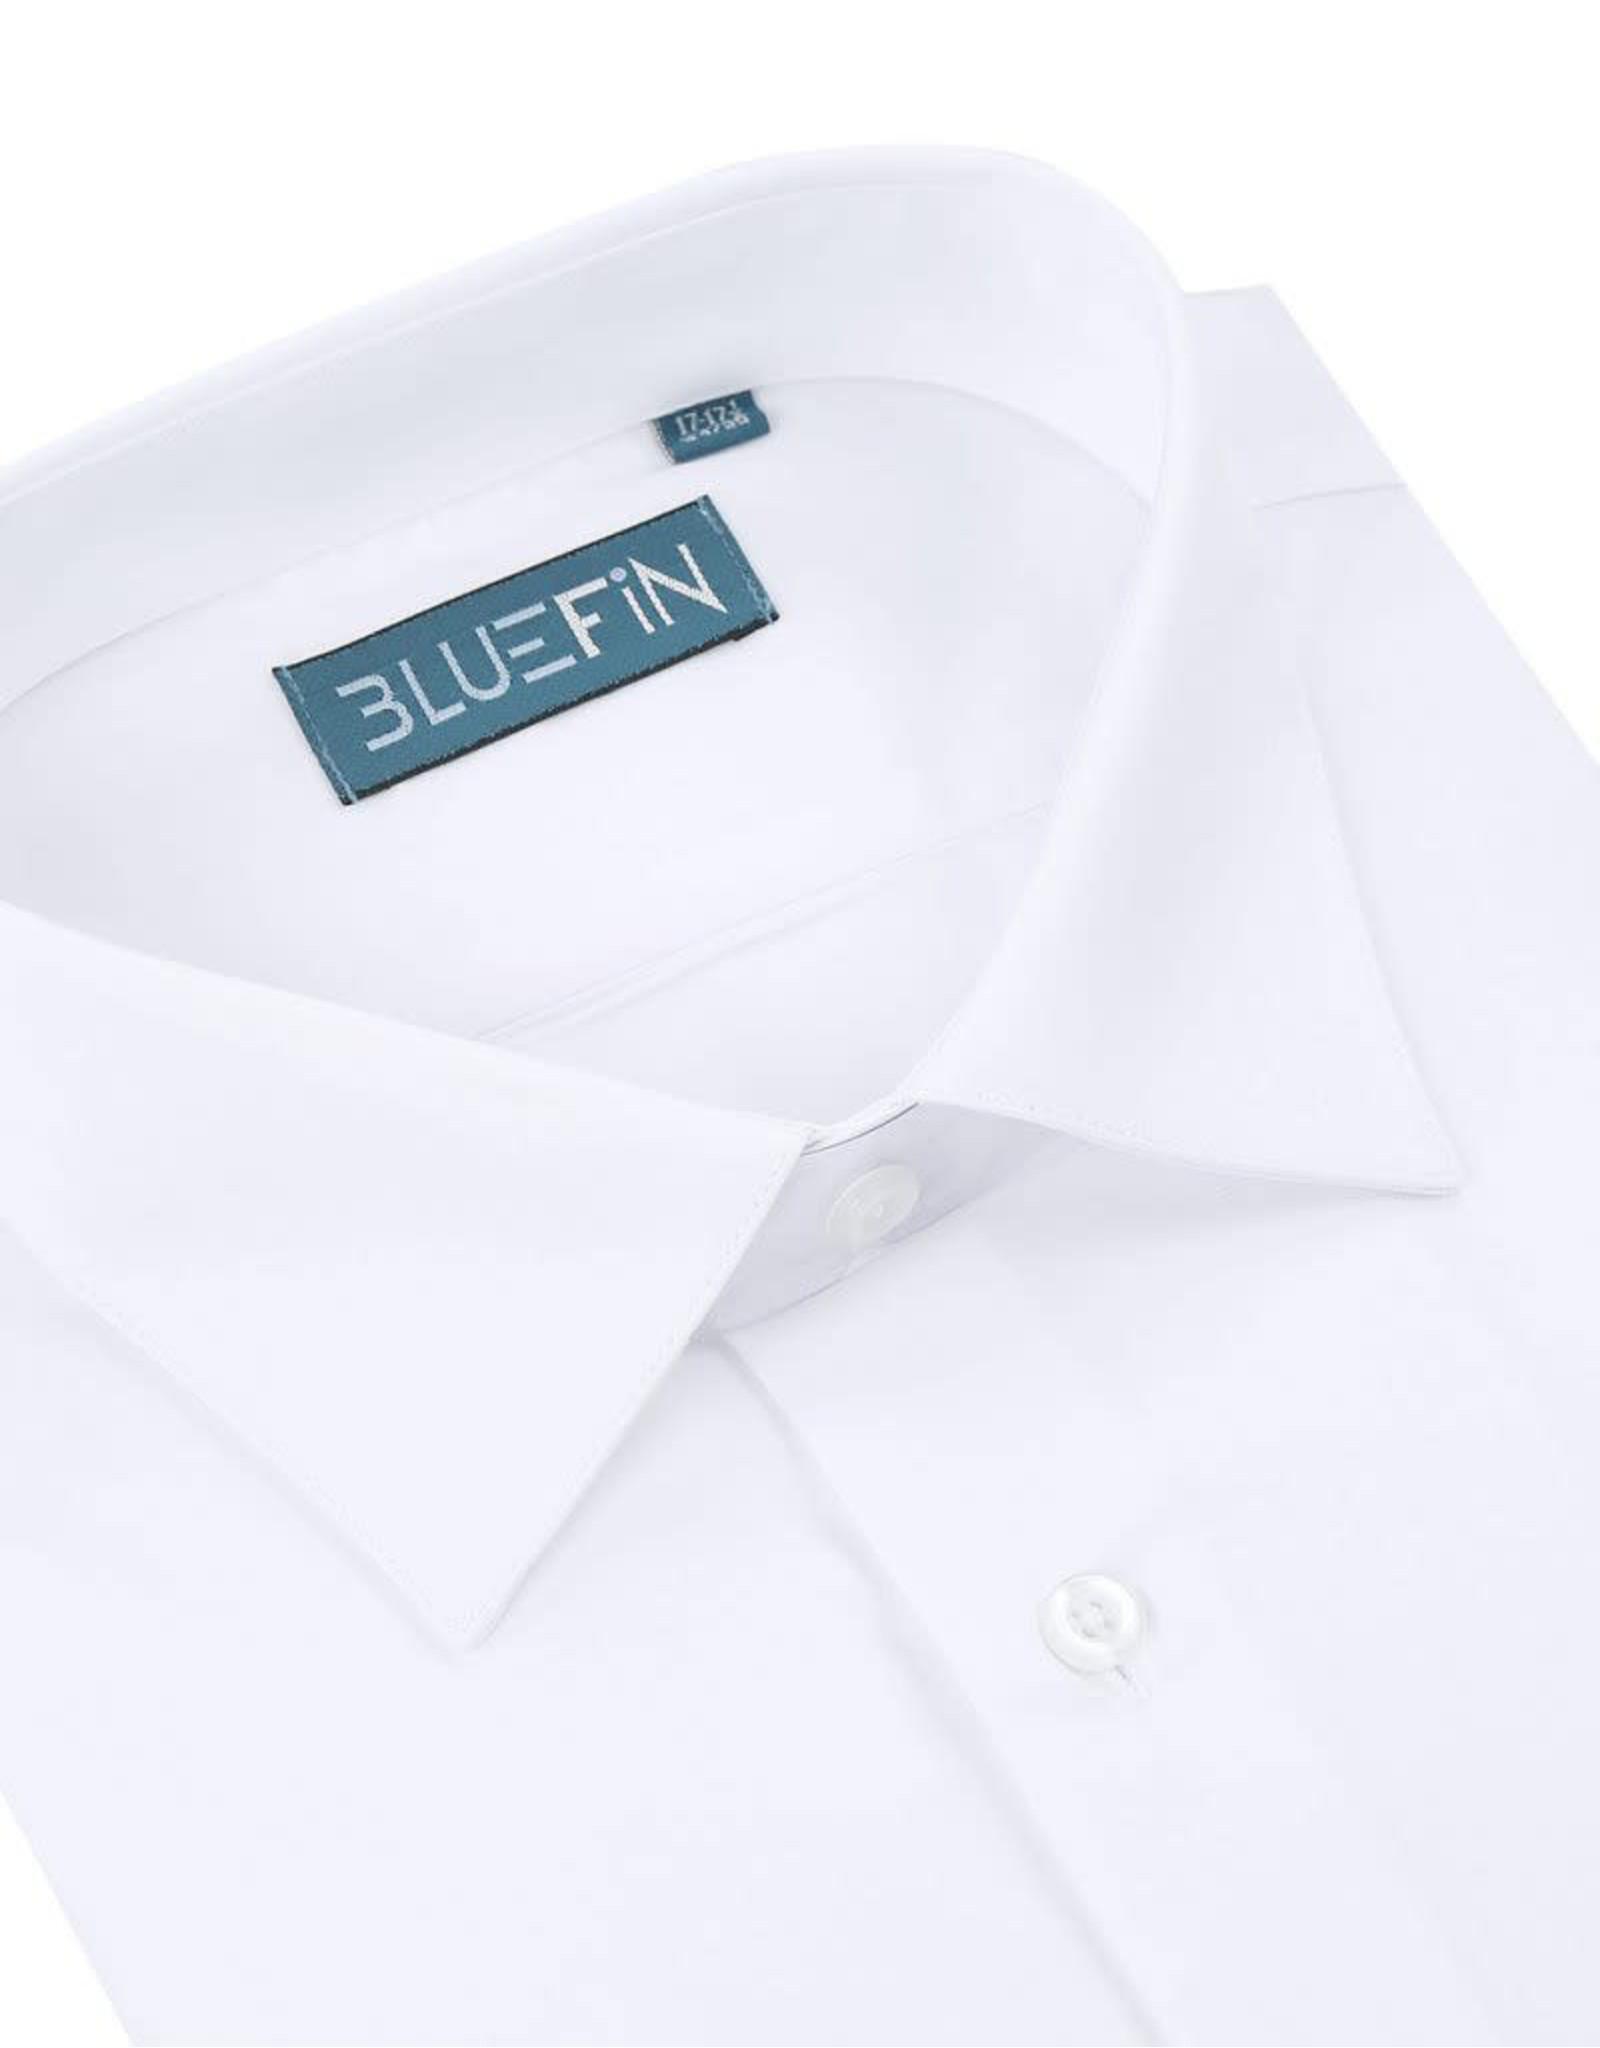 BLUE FIN Slim Fit Dress Shirt